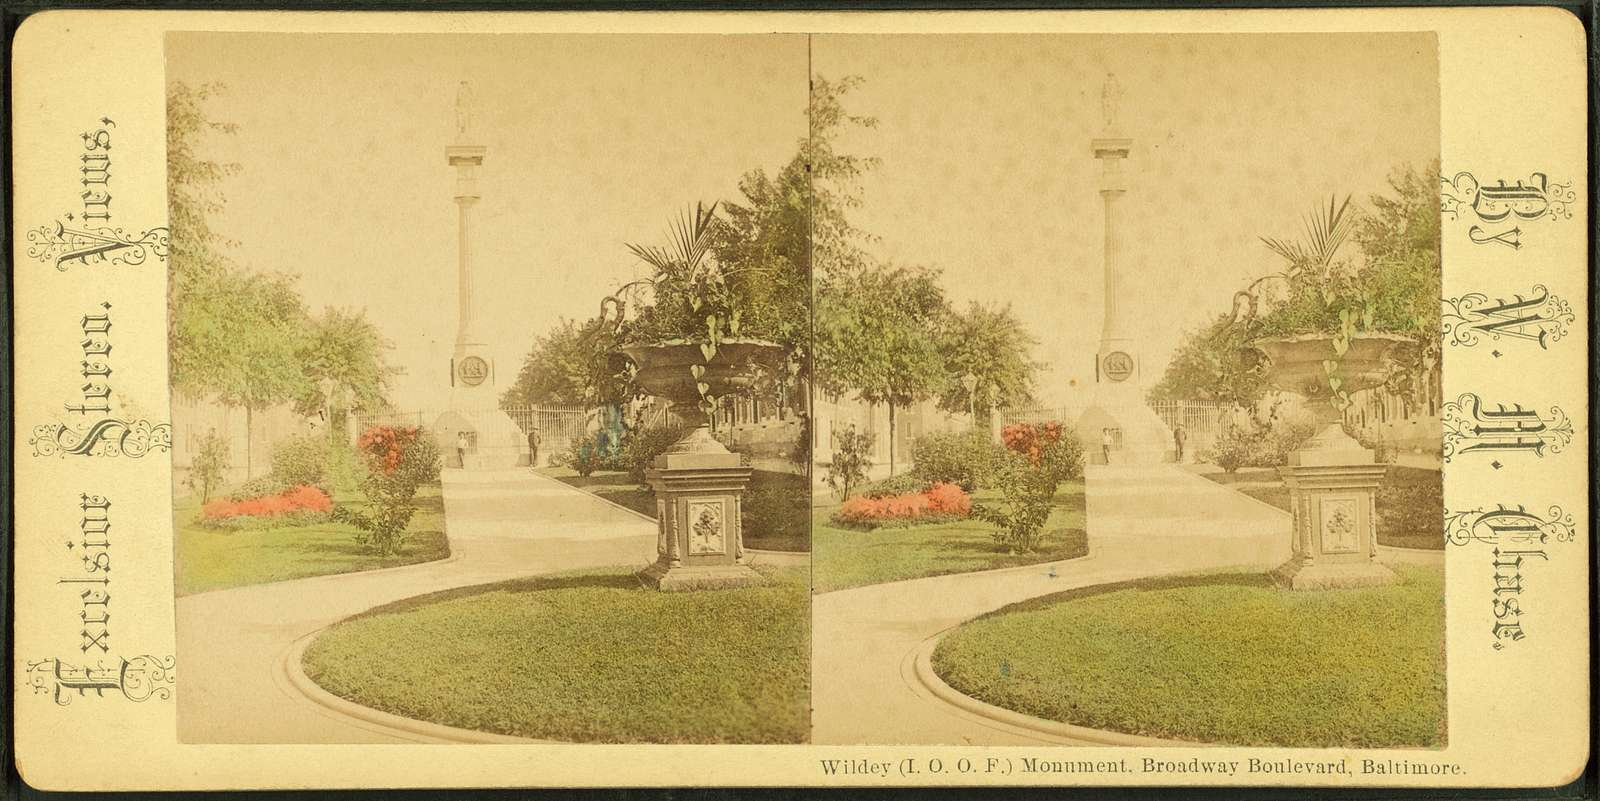 Wildey (I.O.O.F.) Monument. Broadway Bouleward, Baltimore.